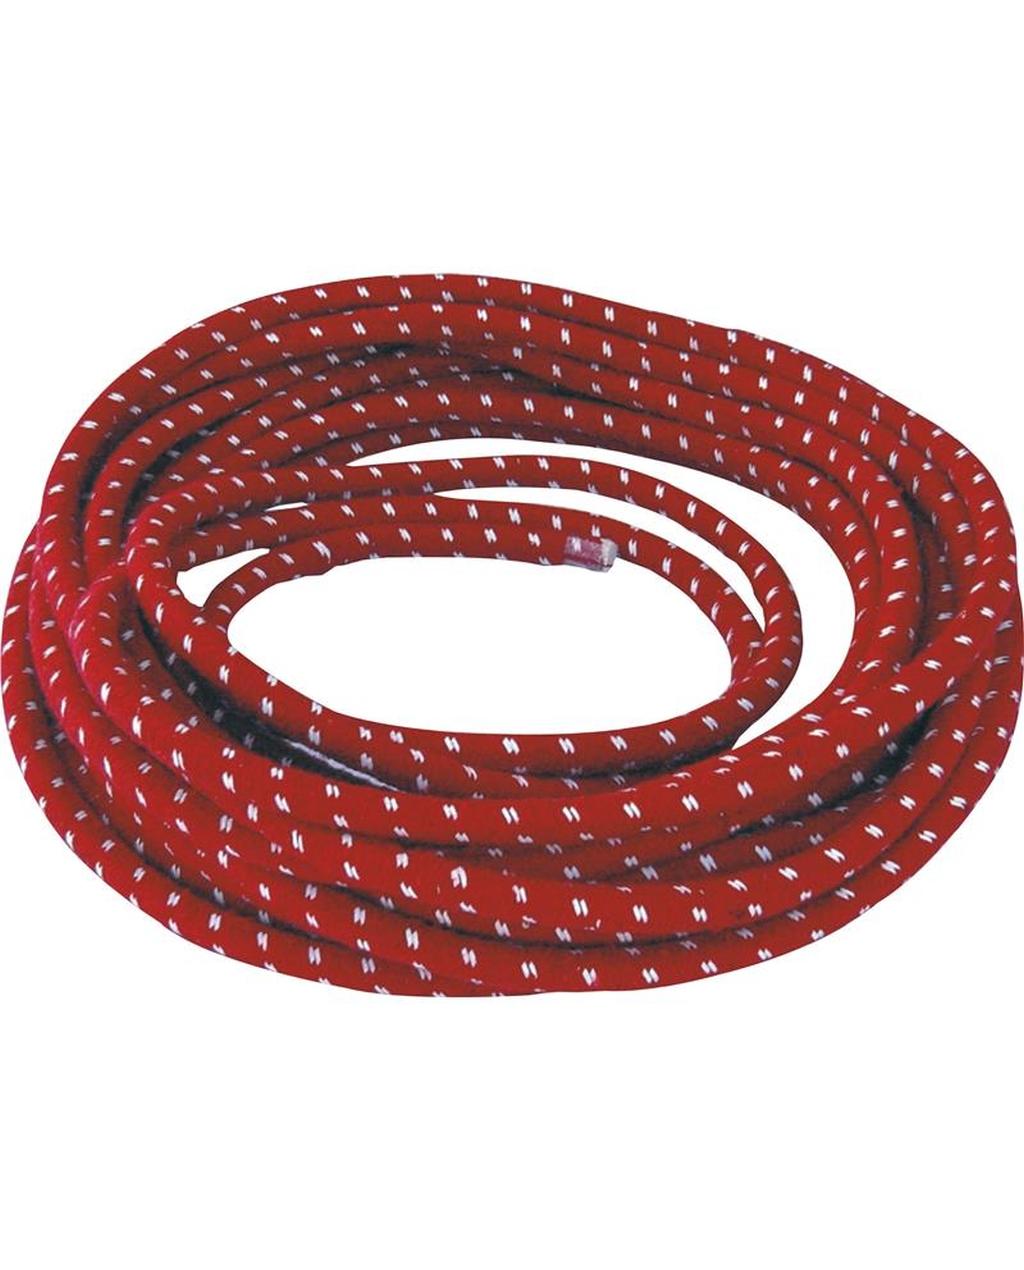 Soft Tug of War Rope